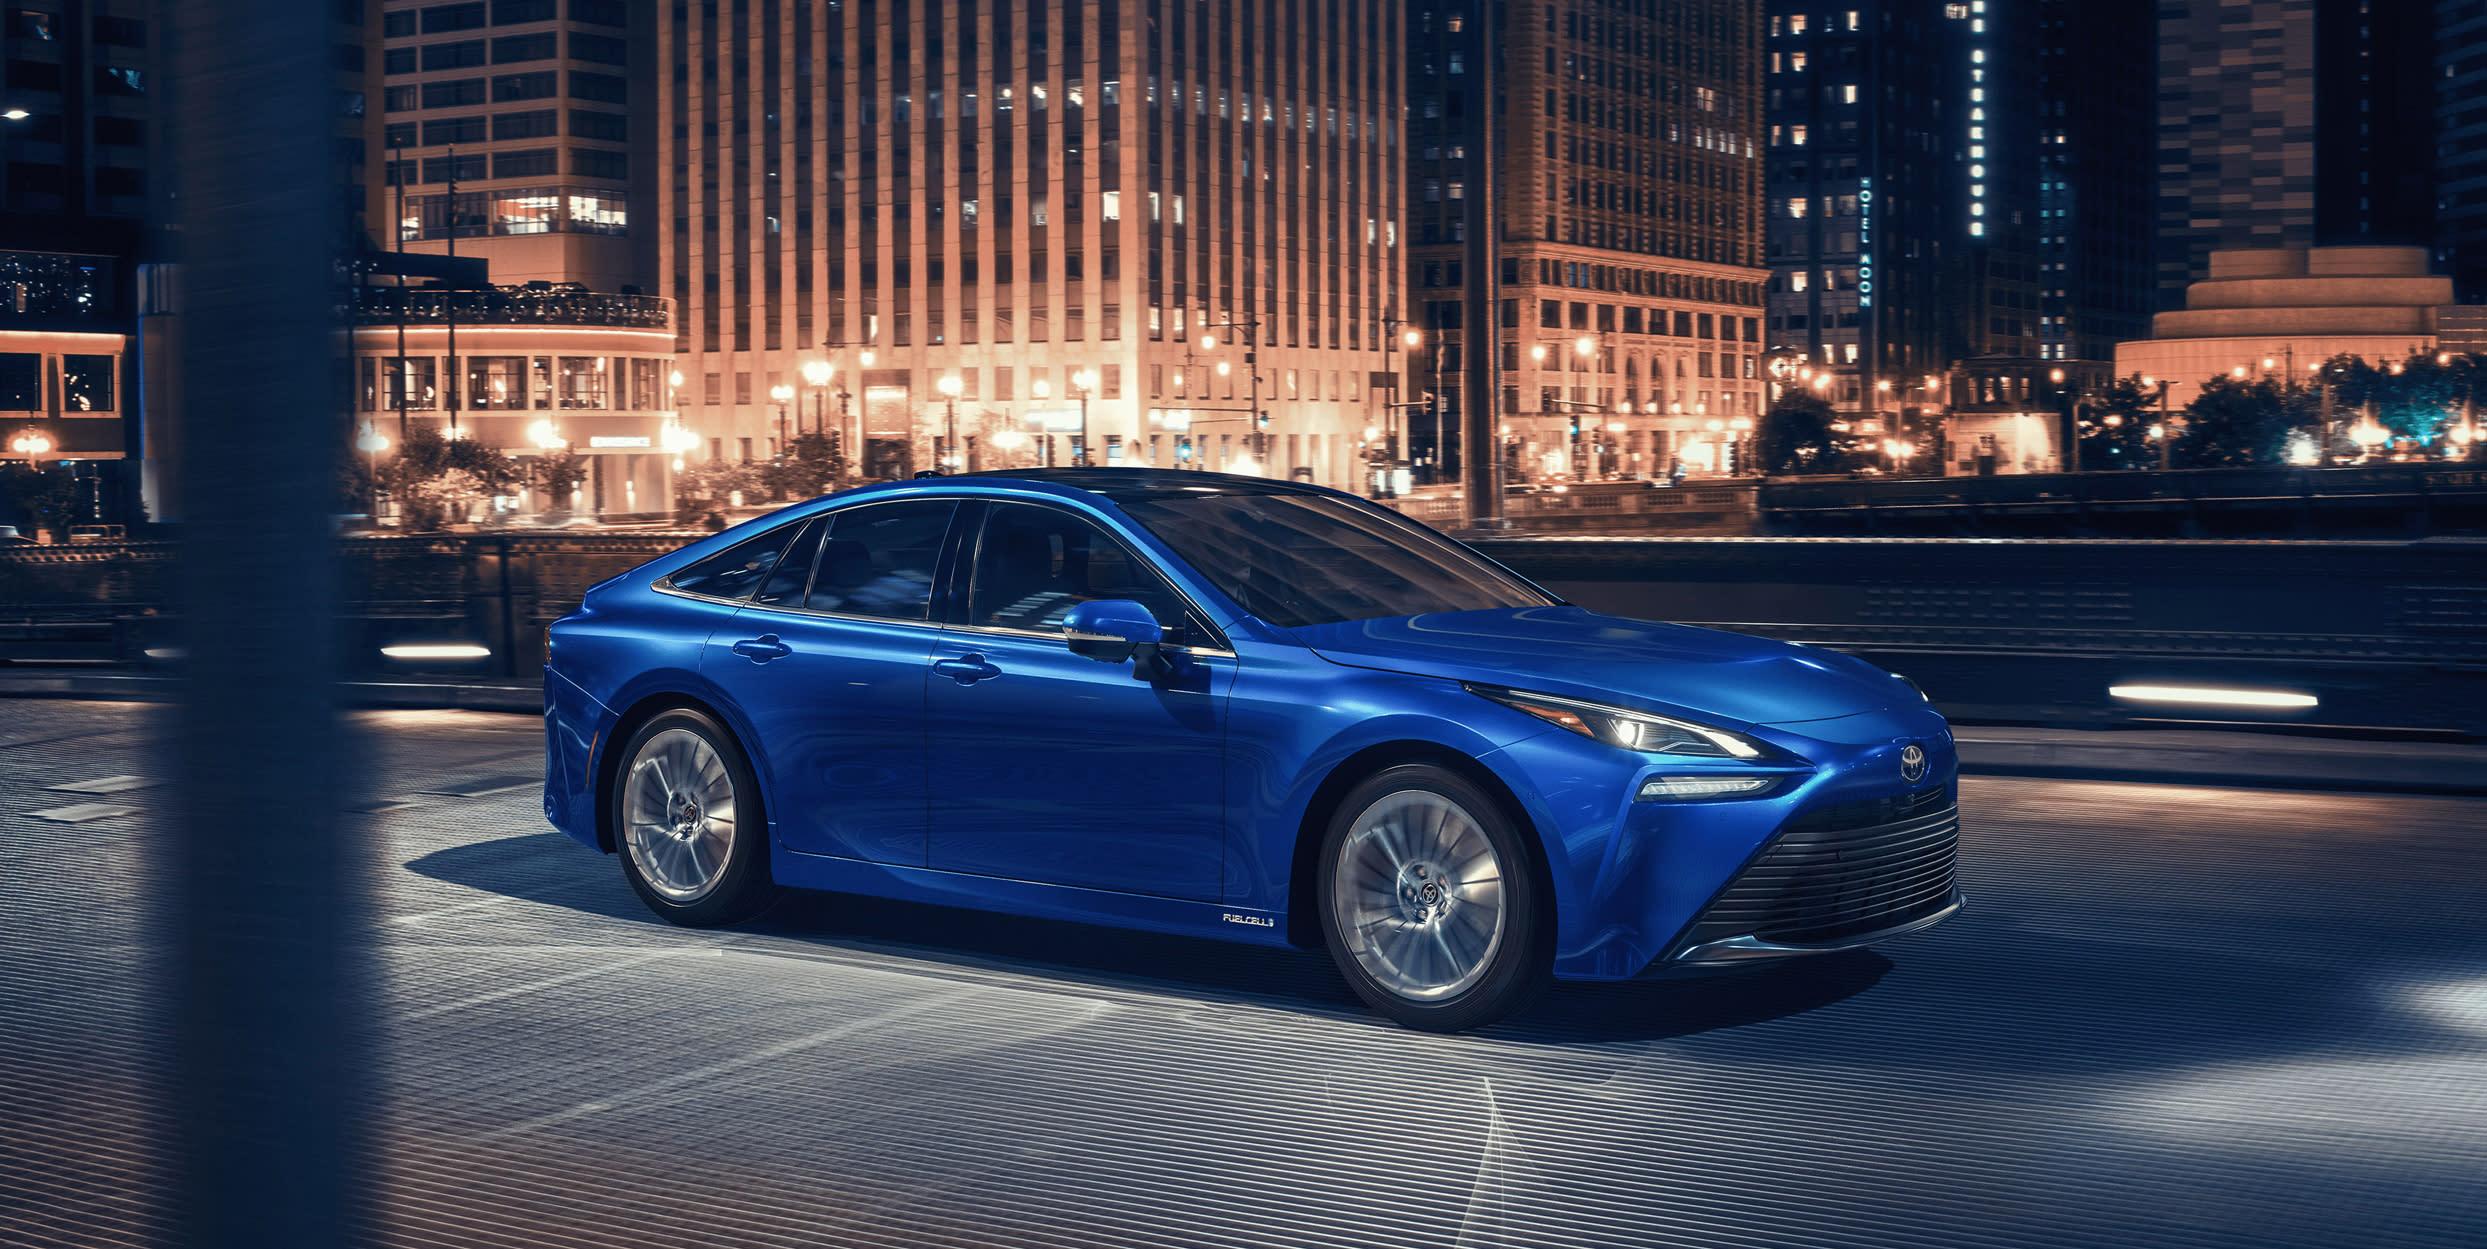 The 2021 Toyota Mirai fuel-cell vehicle cruising through a city environment.